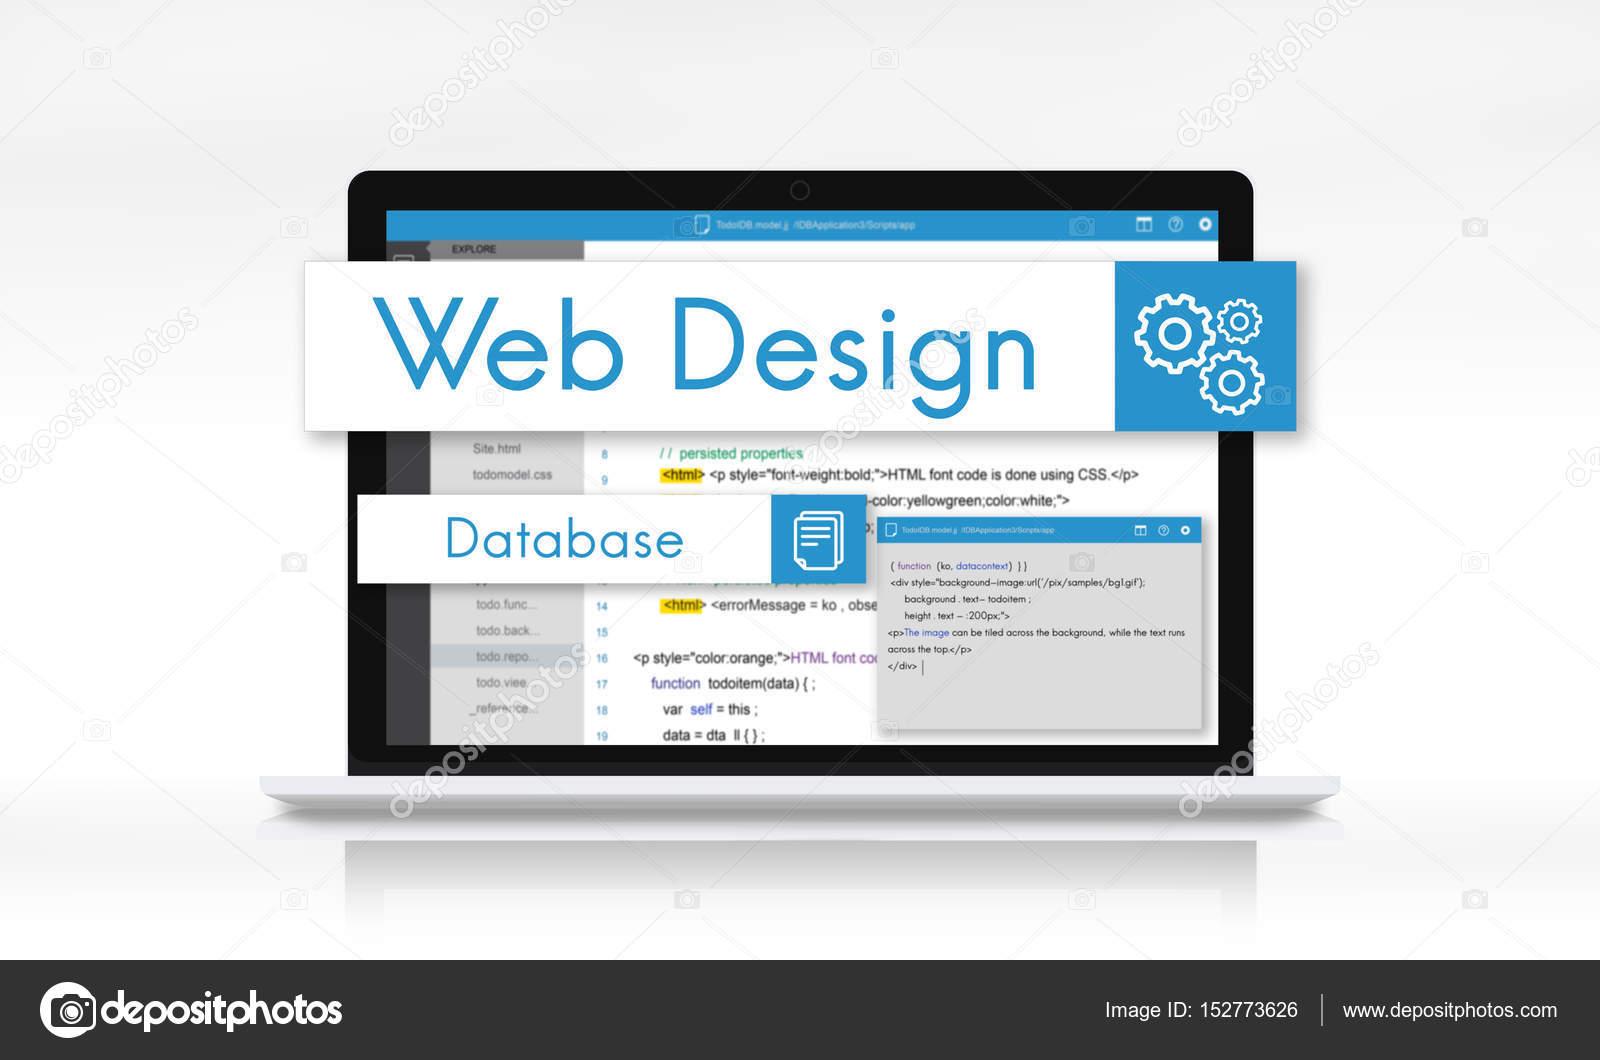 Web Design Vorlage laptop — Stockfoto © Rawpixel #152773626